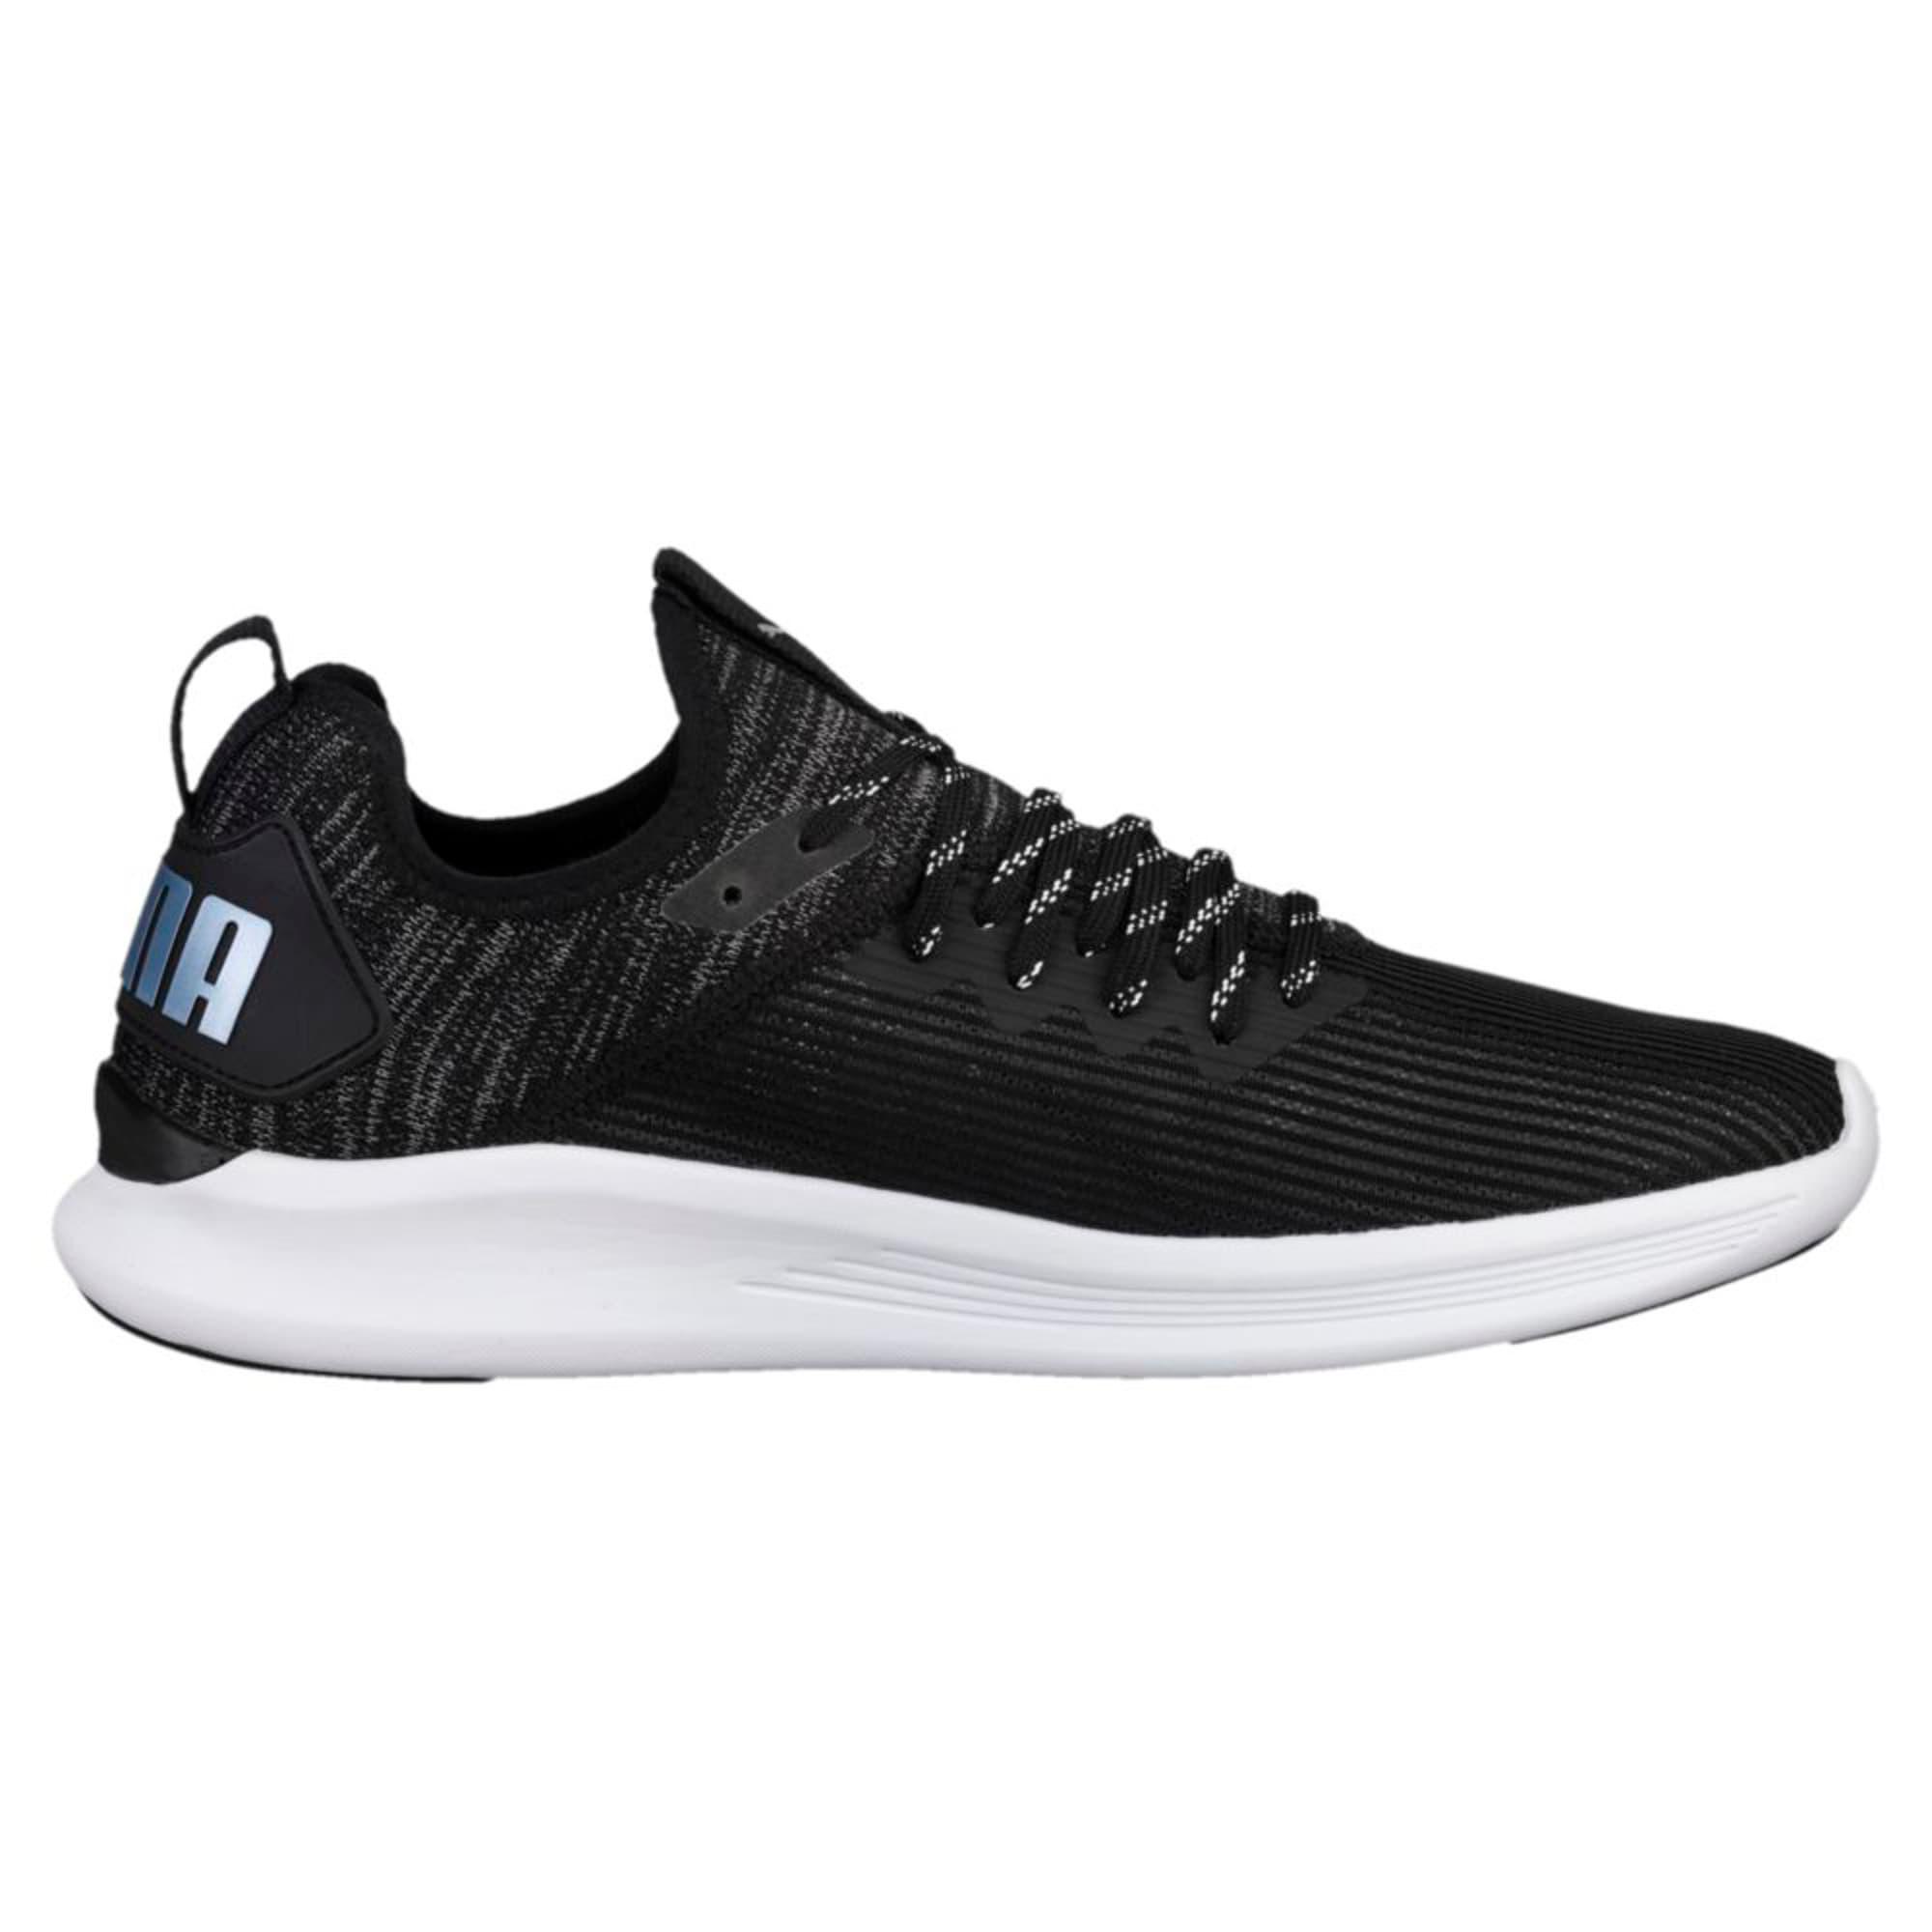 Thumbnail 3 of IGNITE Flash Stripped Men's Running Shoes, Puma Black-QUIET SHADE, medium-IND